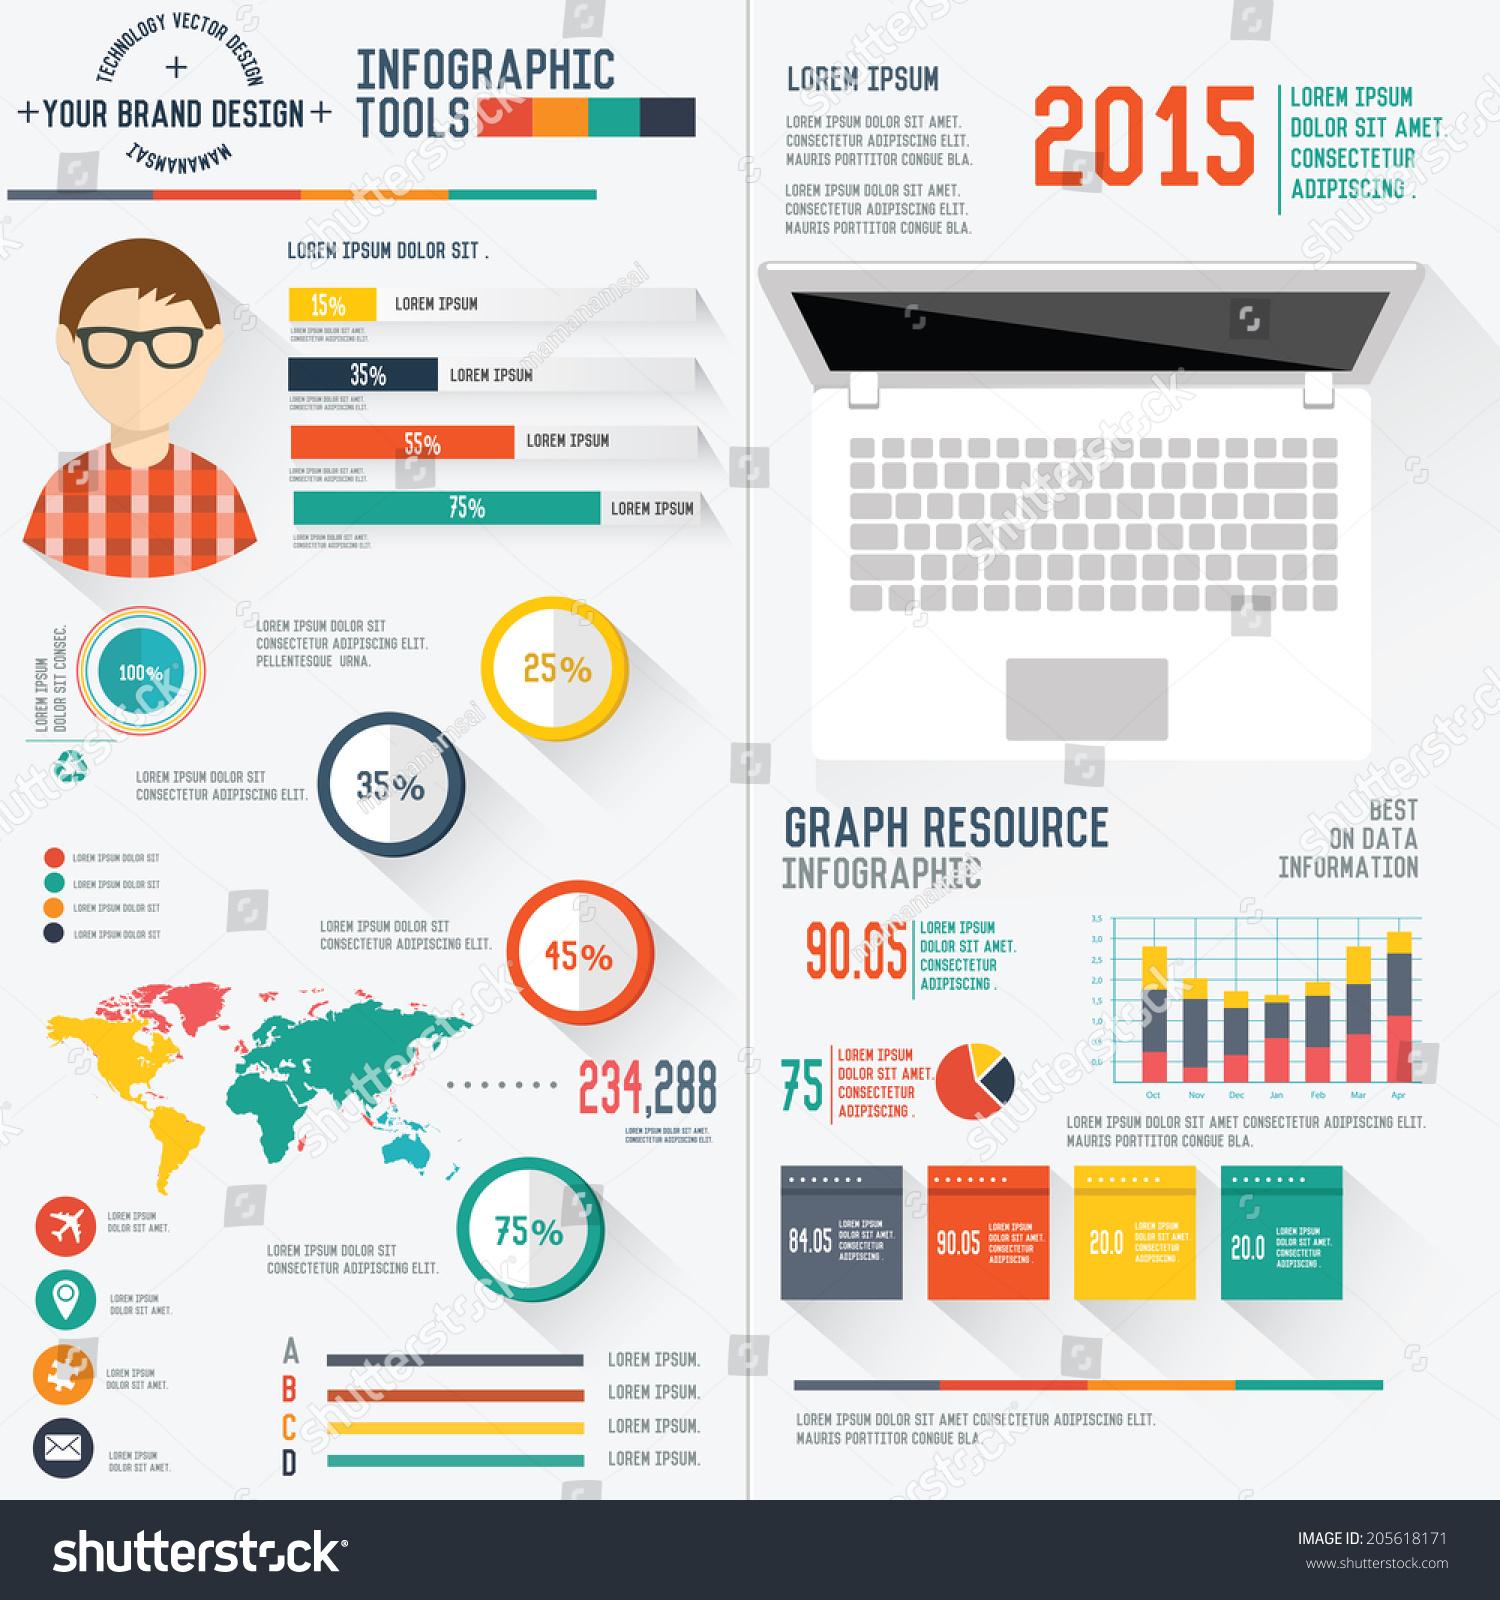 user design resume info graphic design on white background